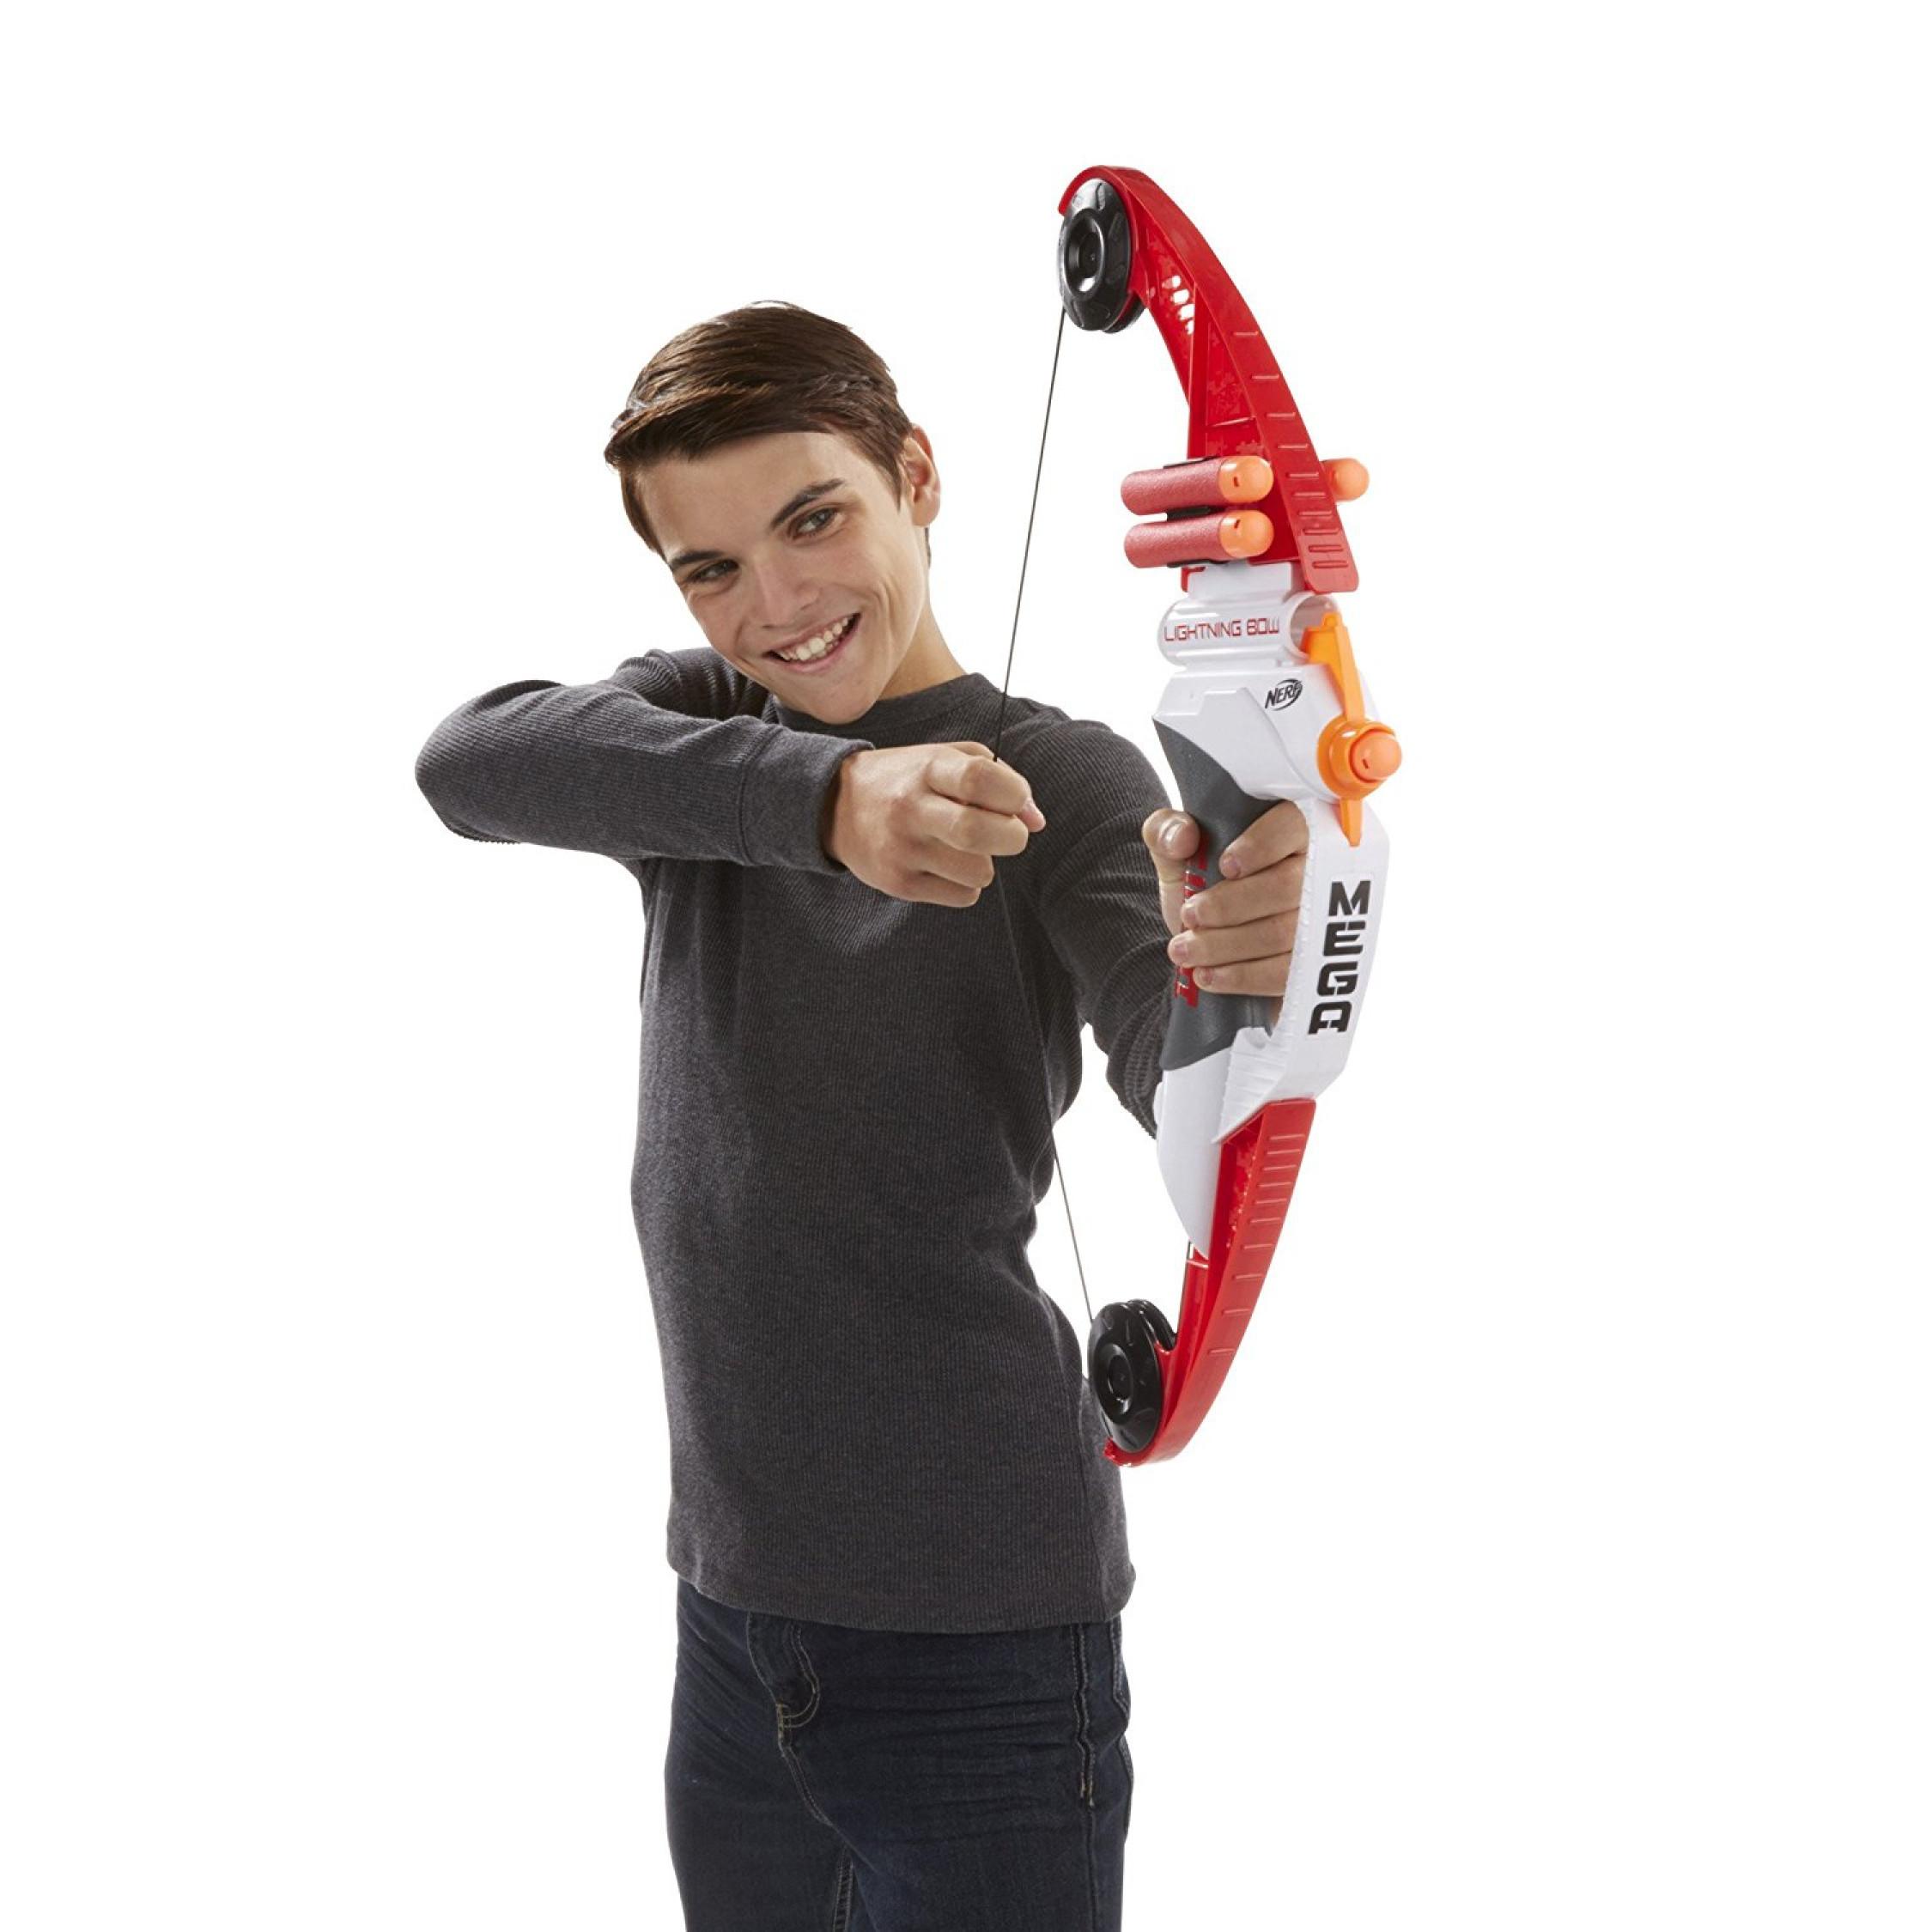 NERF N-Strike Blazin Bow and Arrow Gun Blaster Boy Toy Outdoor Play Foam  Target